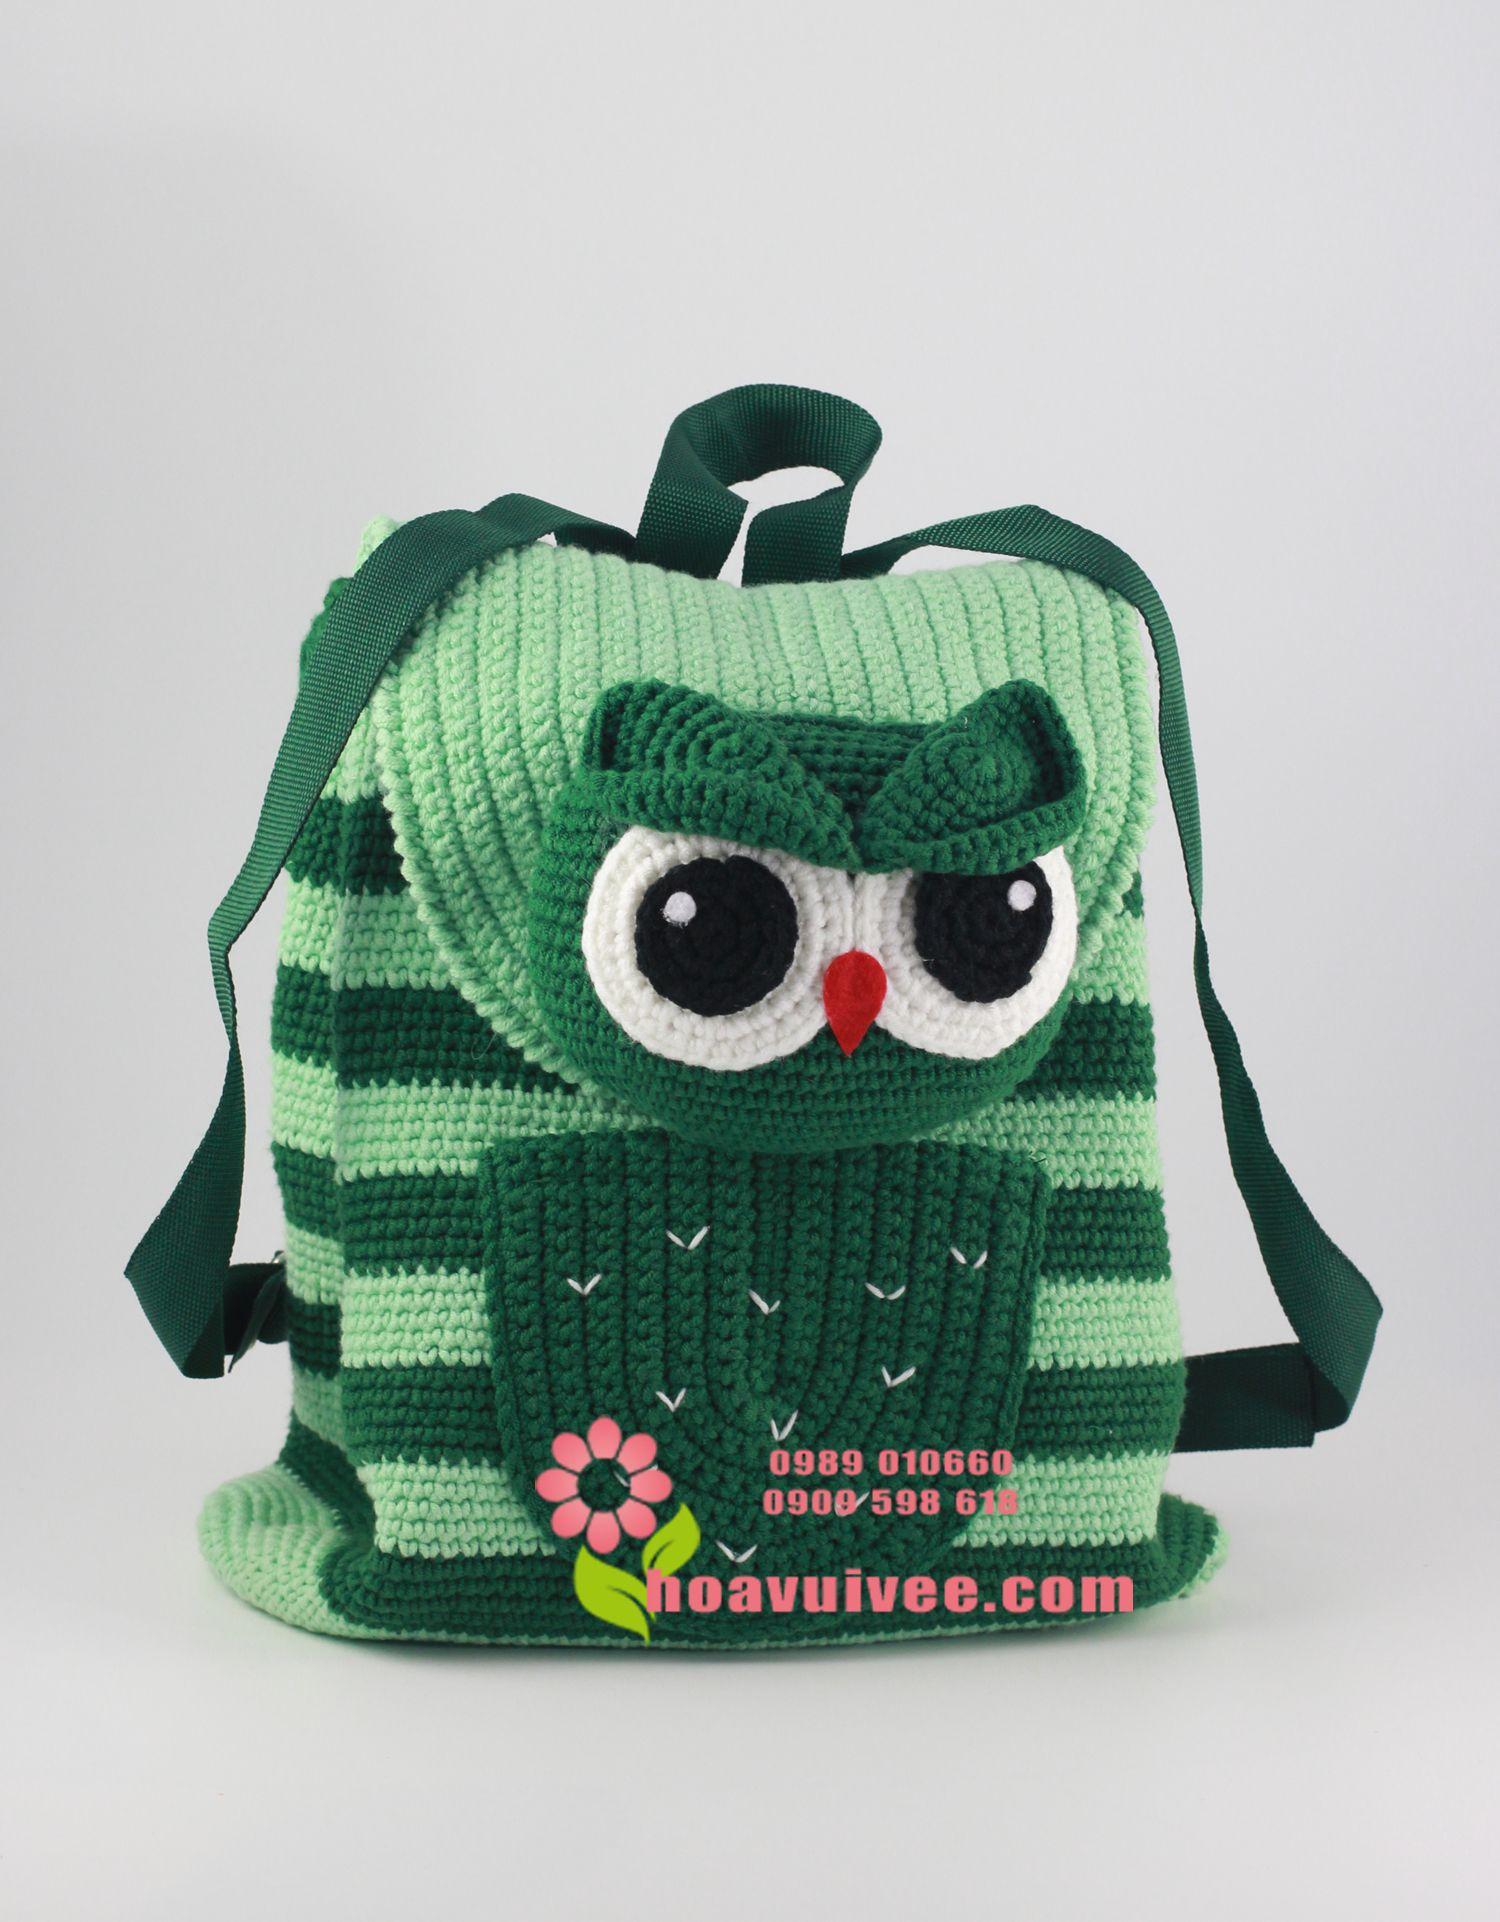 handmade bag Crochet kids bag crochet children backpack,crochet purse crochet kindergarten bag children bag handmade crochet backpack